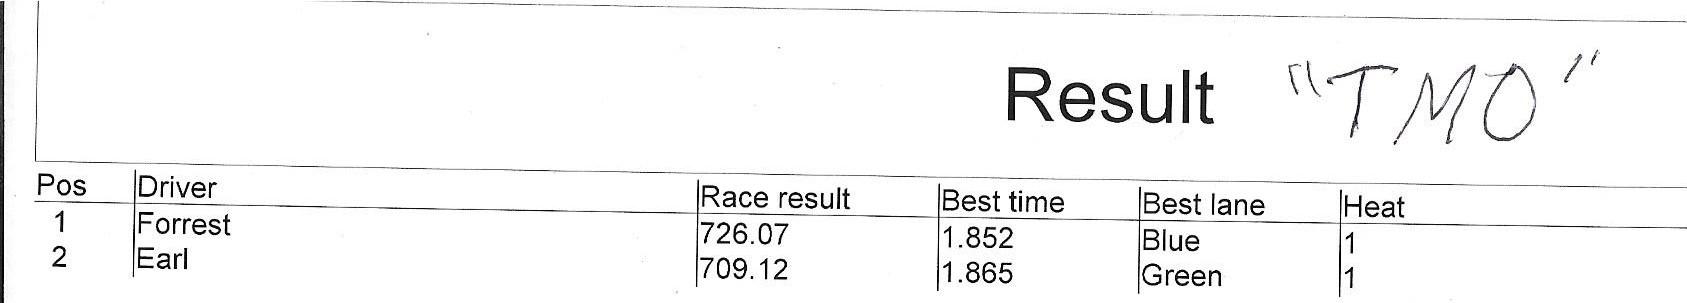 9819 tmo results.jpeg